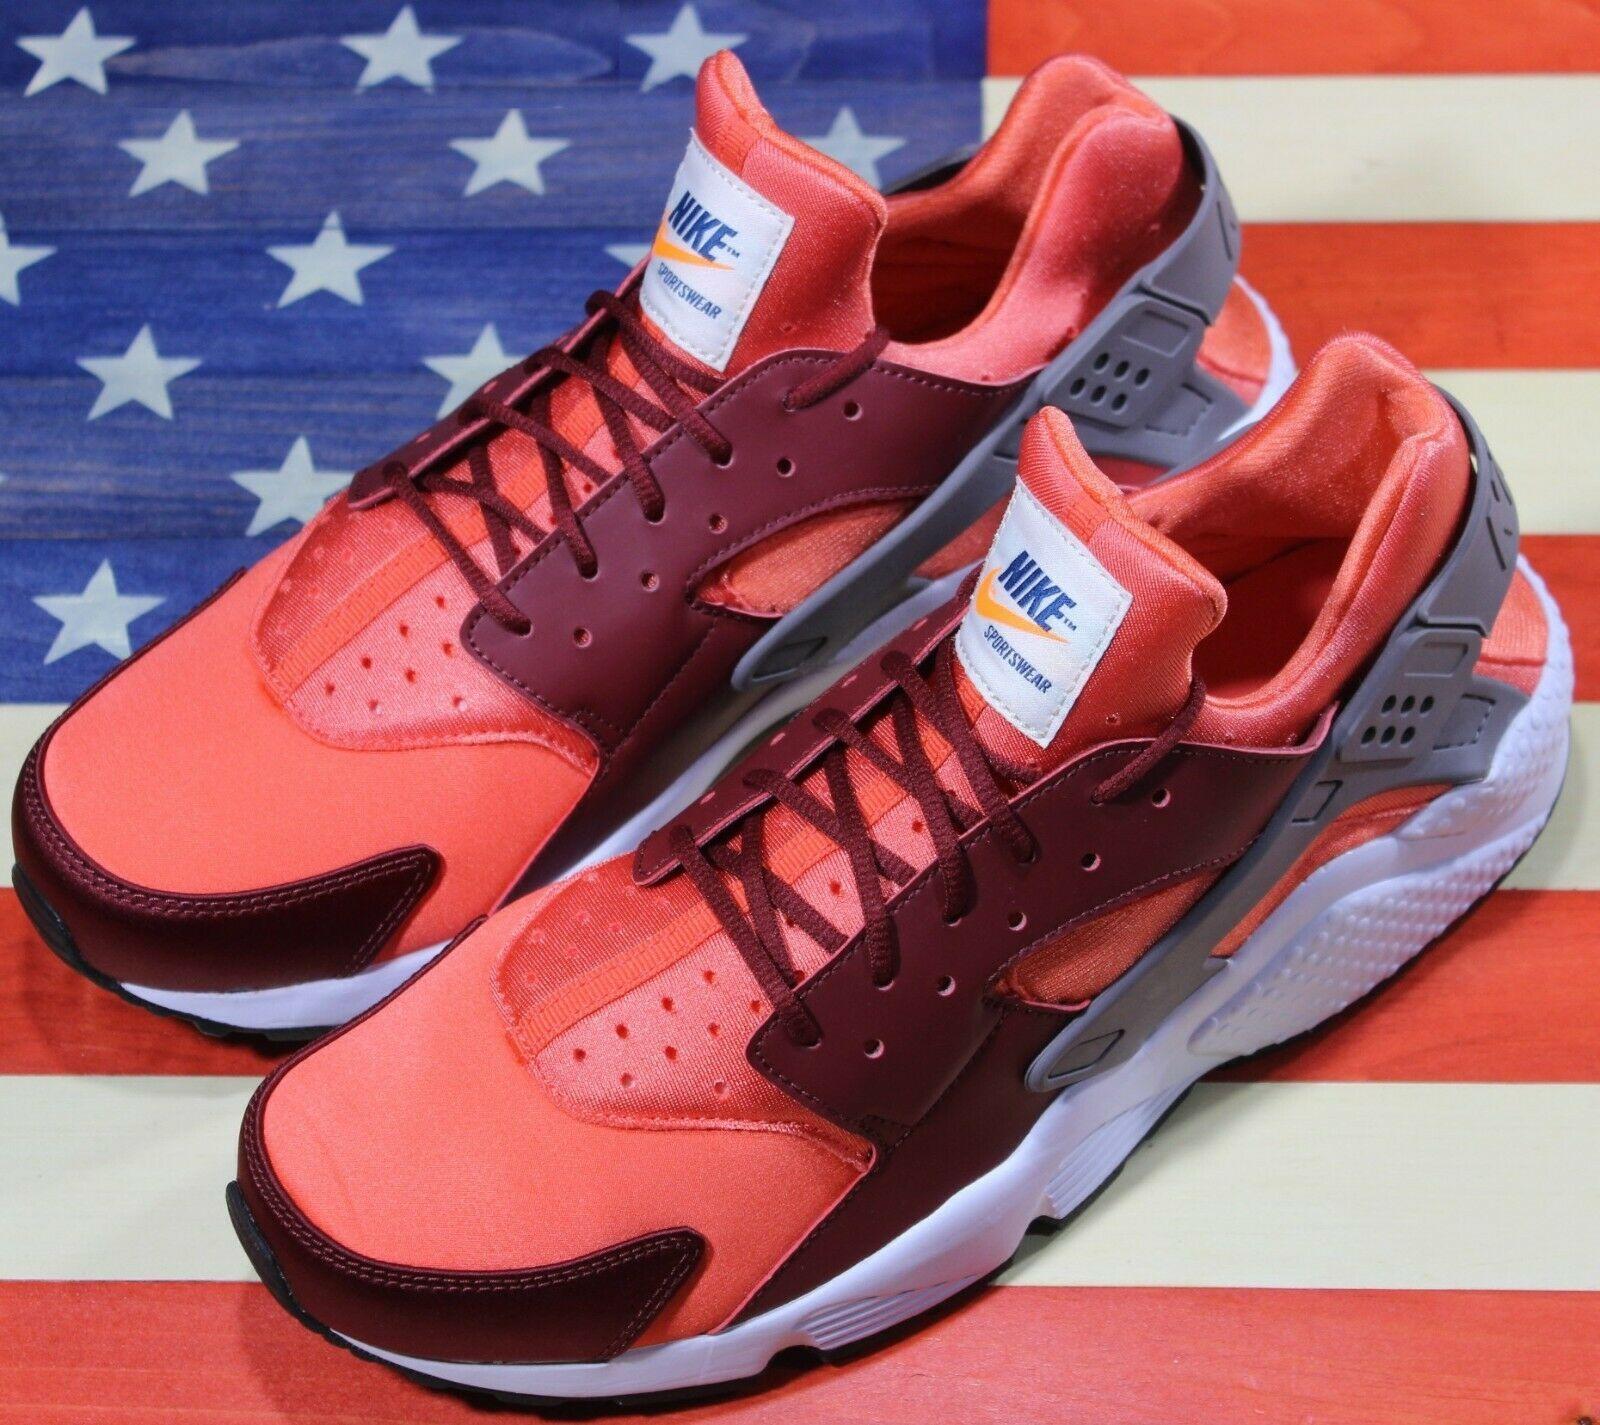 Nike Air Huarache Run Running Shoes Team Red Coral White [318429-054] Men's 11.5 image 9